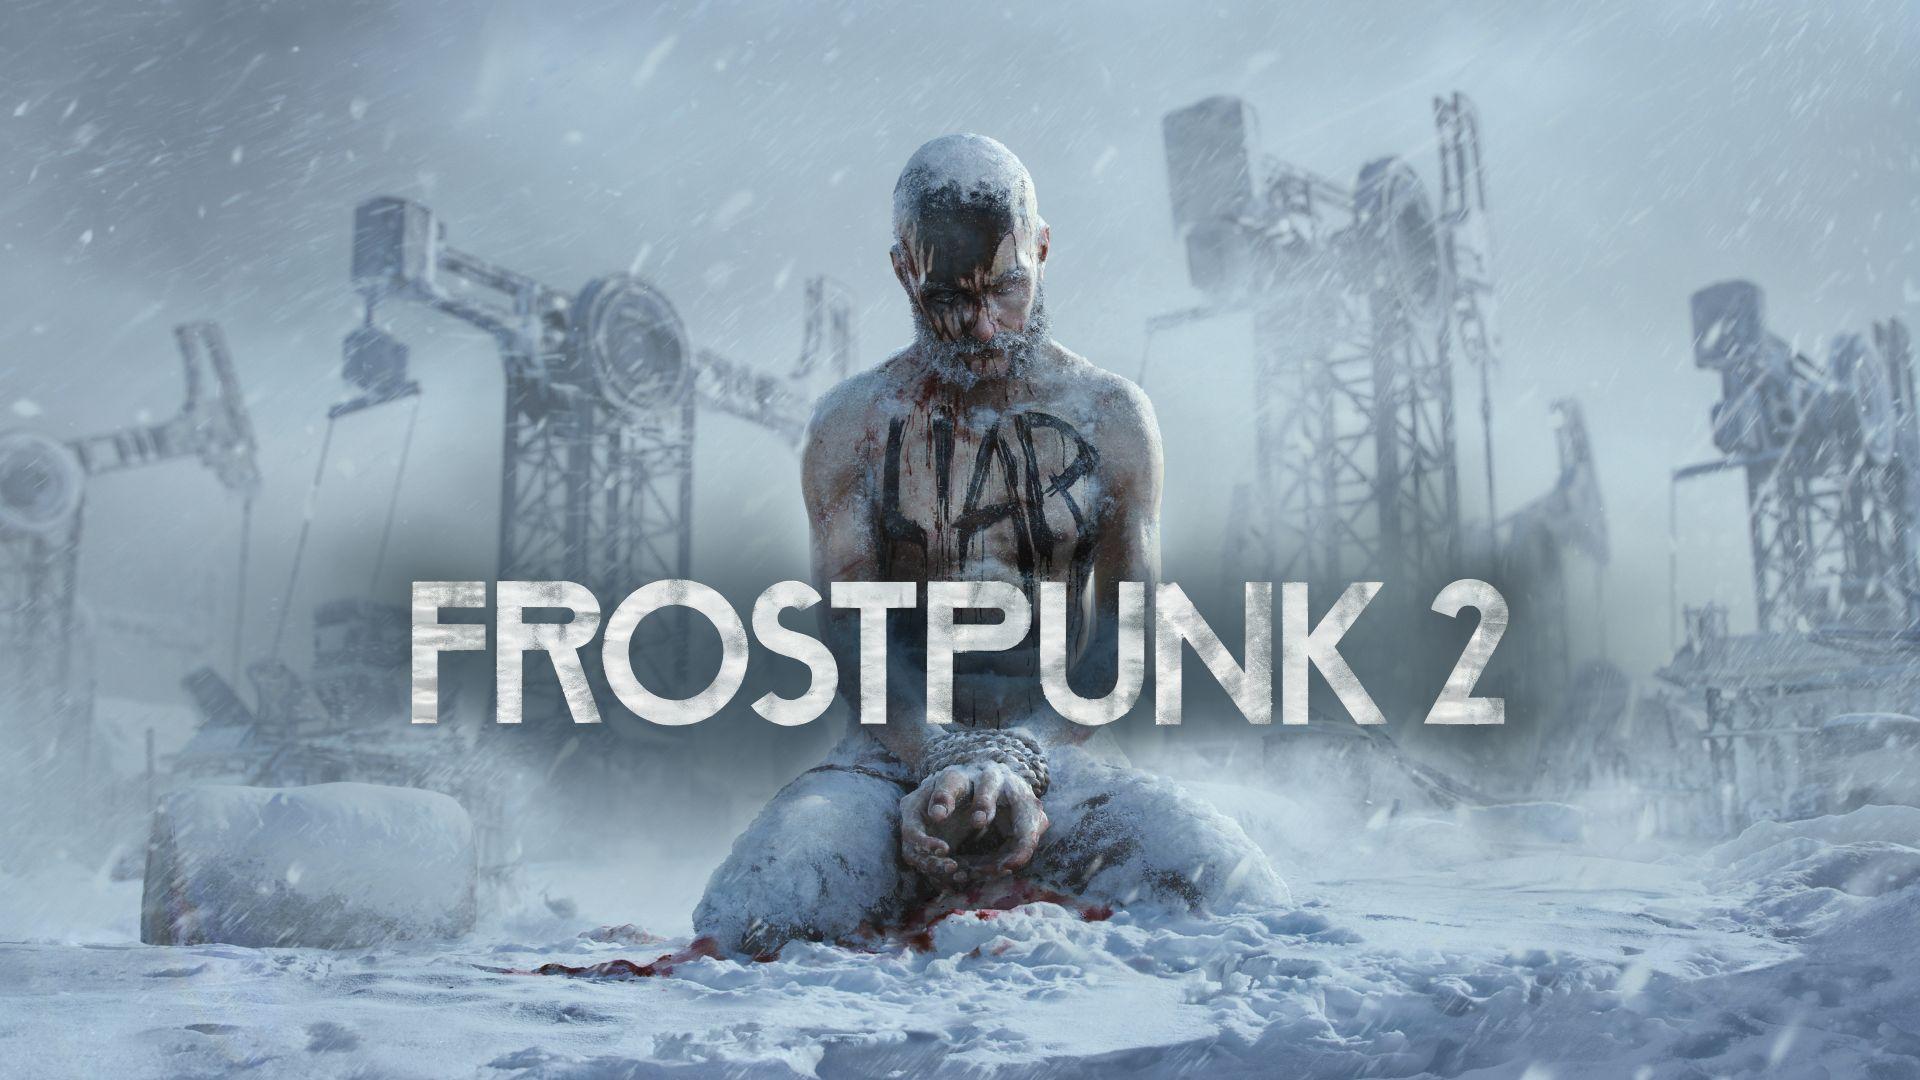 Survival-city builder Frostpunk 2 has been announced